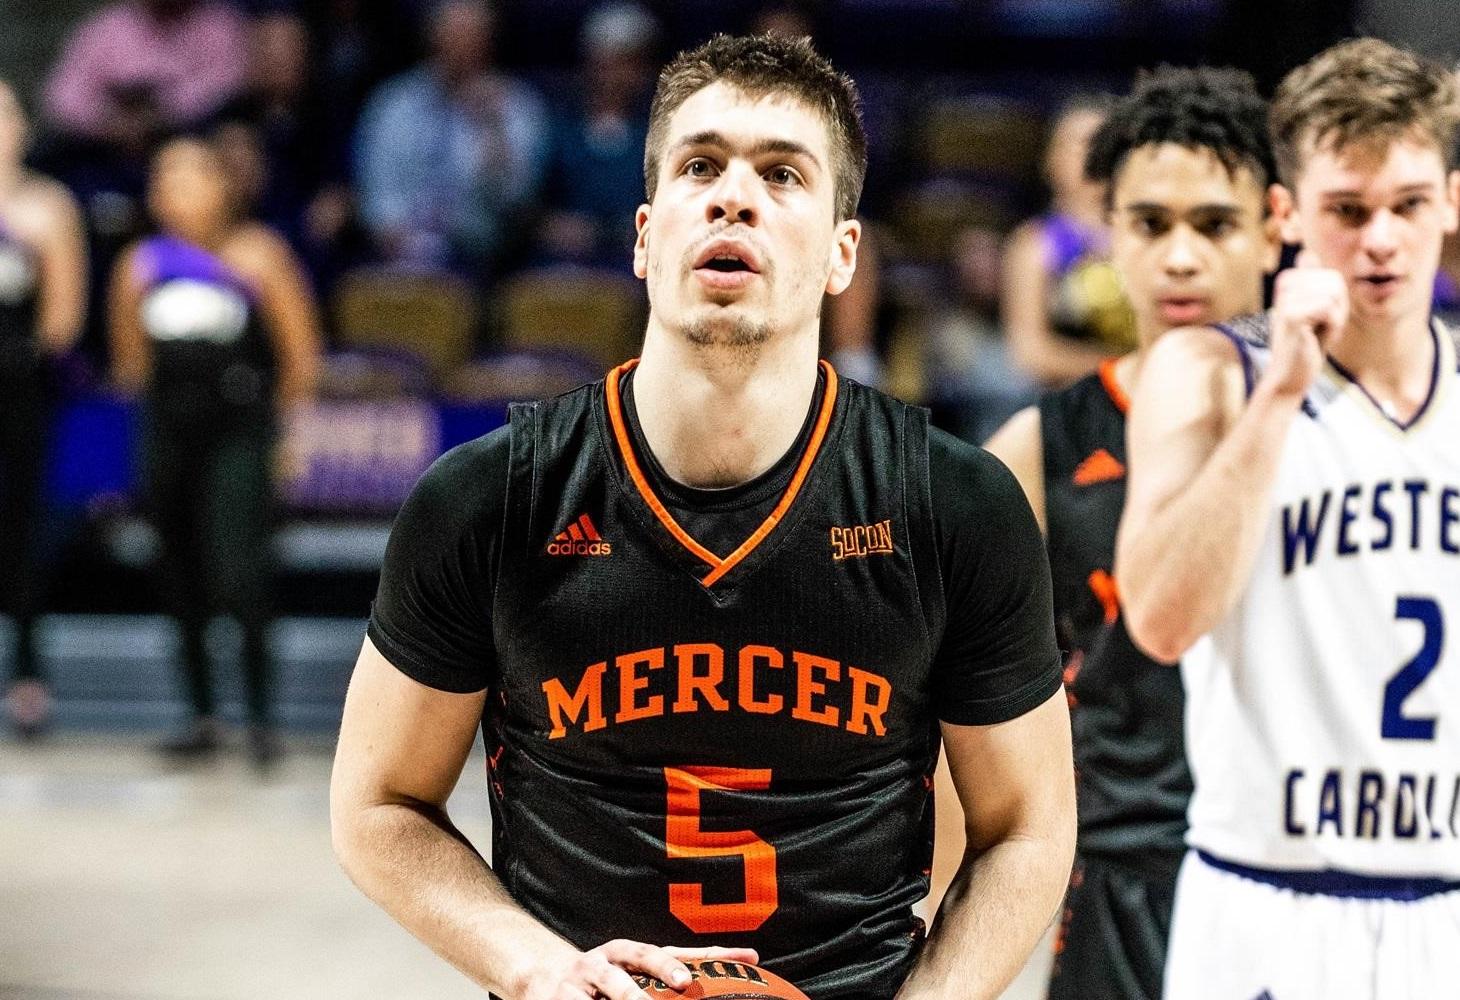 Djordje Dimitrijevic Mercer Europei in NCAA Gennaio 2020